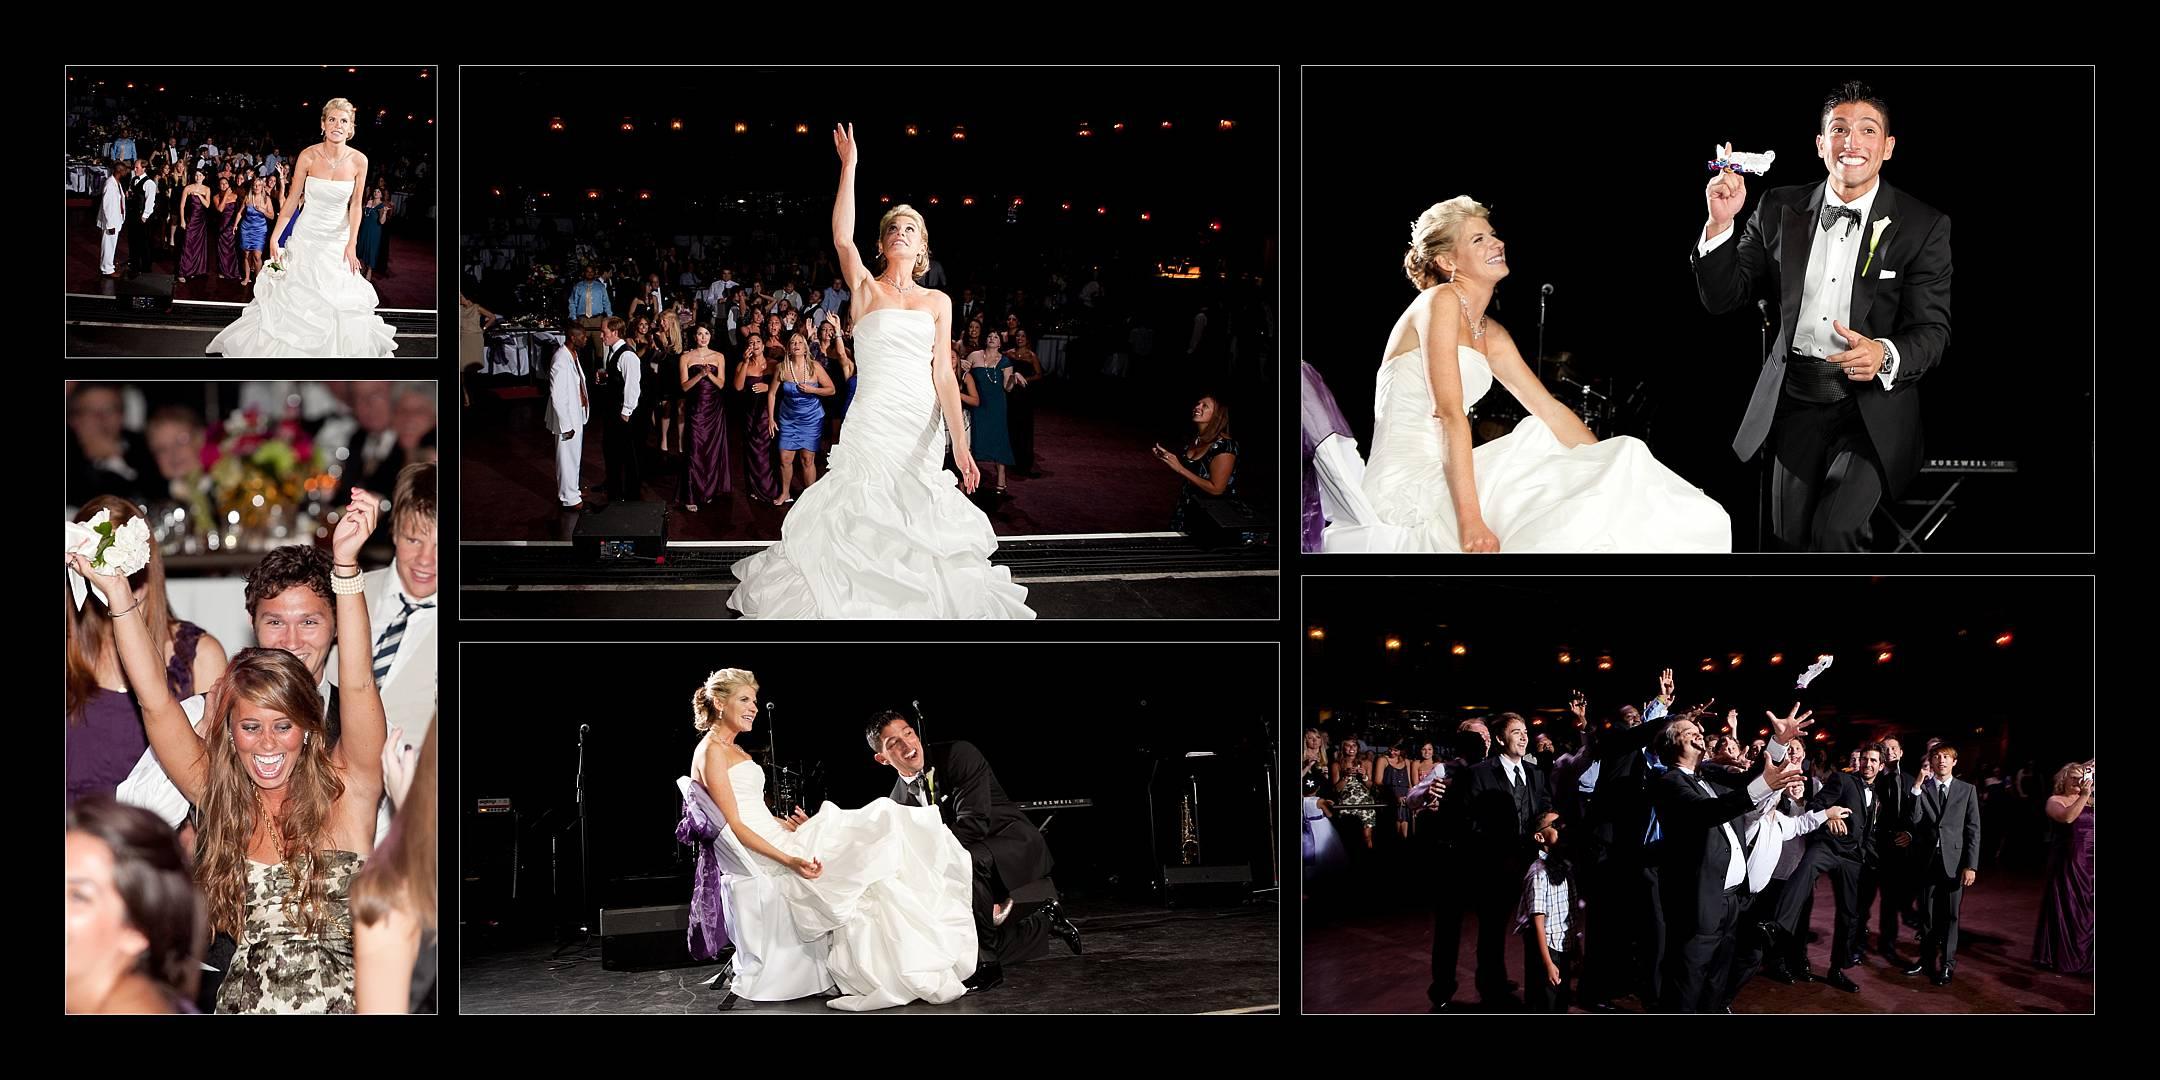 schmidt-photo-wedding-photography-chicago_2311